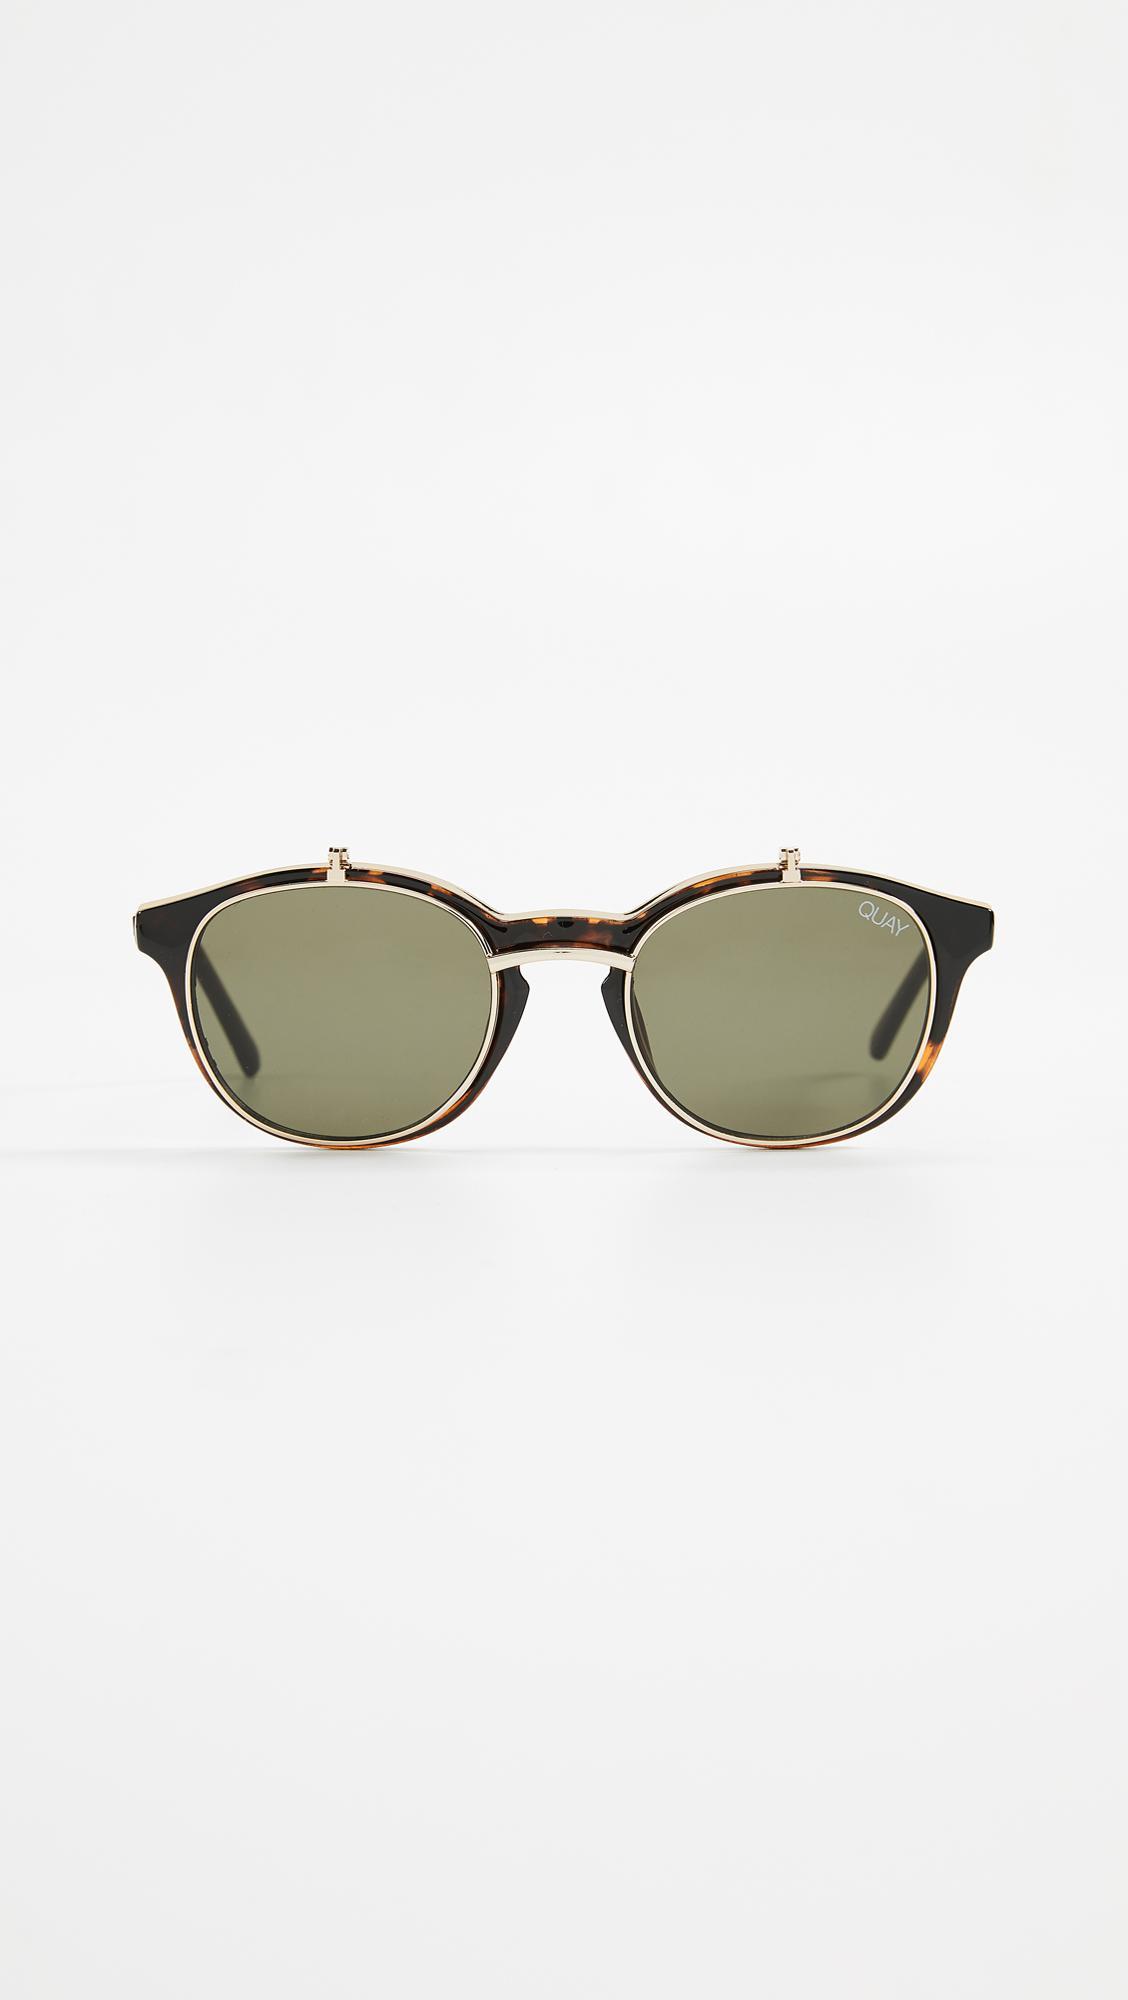 0e33b7a096 Quay - Multicolor Pennyroyal Sunglasses - Lyst. View fullscreen